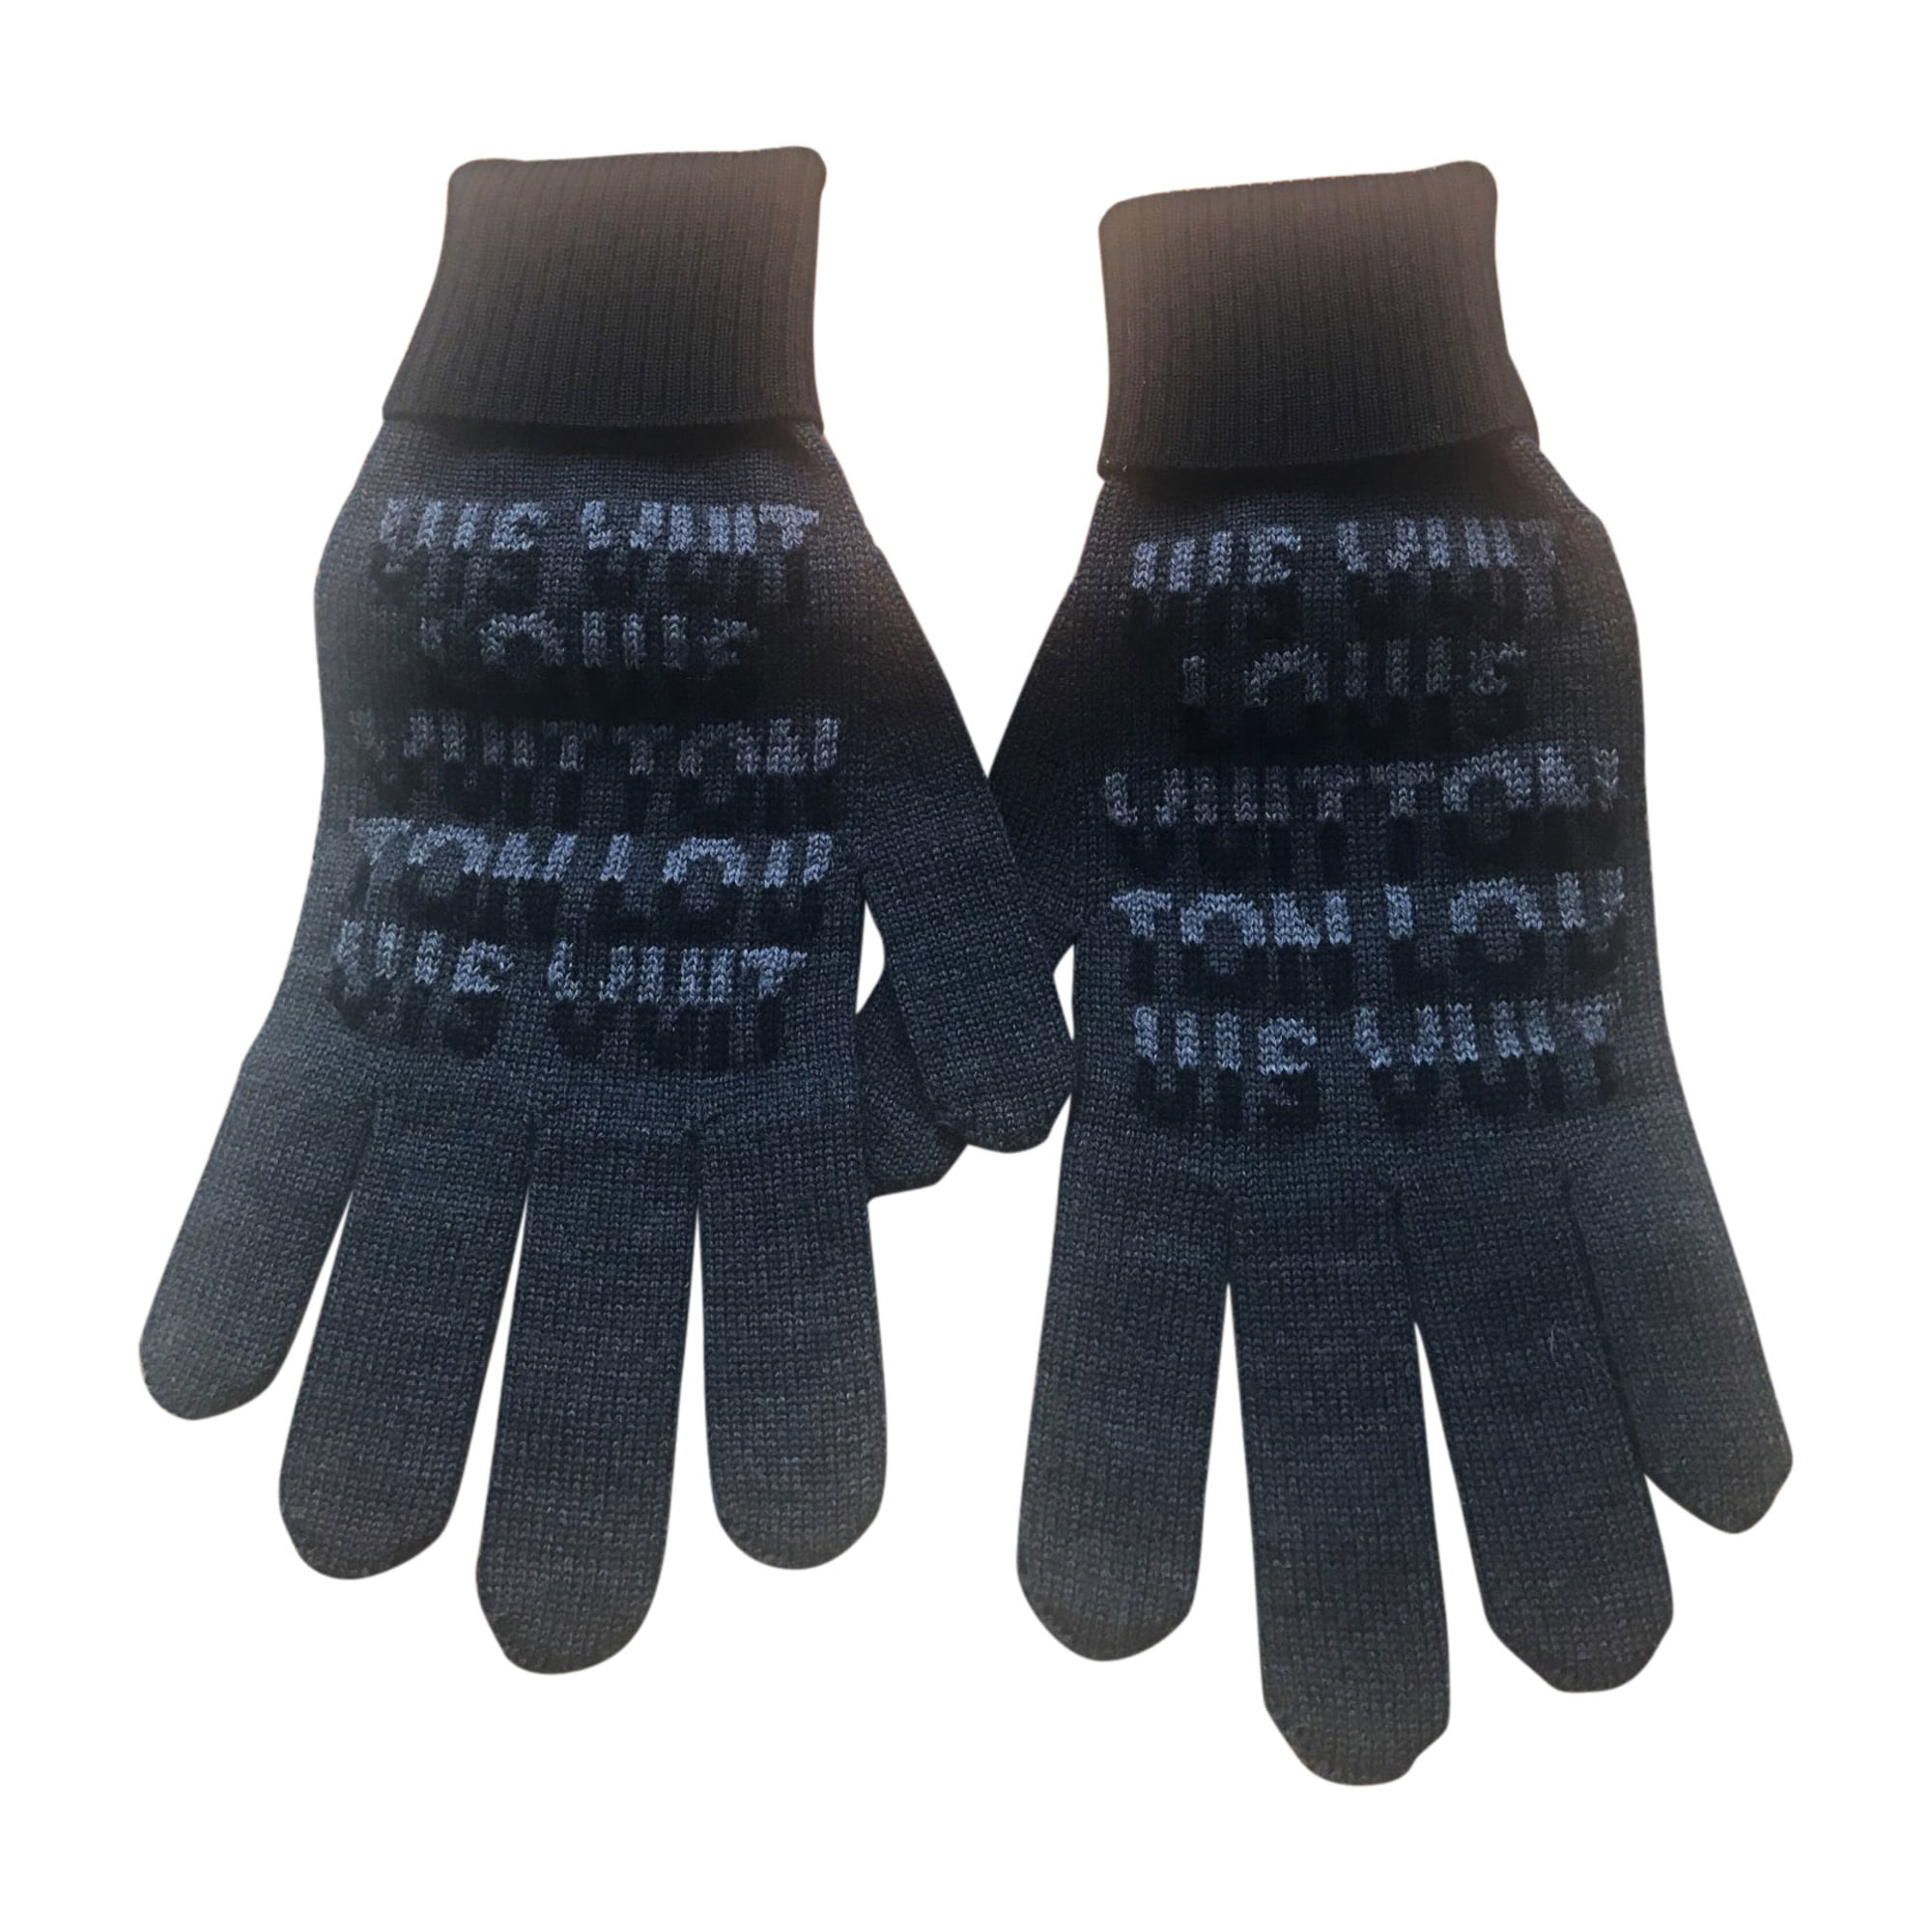 Gloves LOUIS VUITTON Gray, charcoal